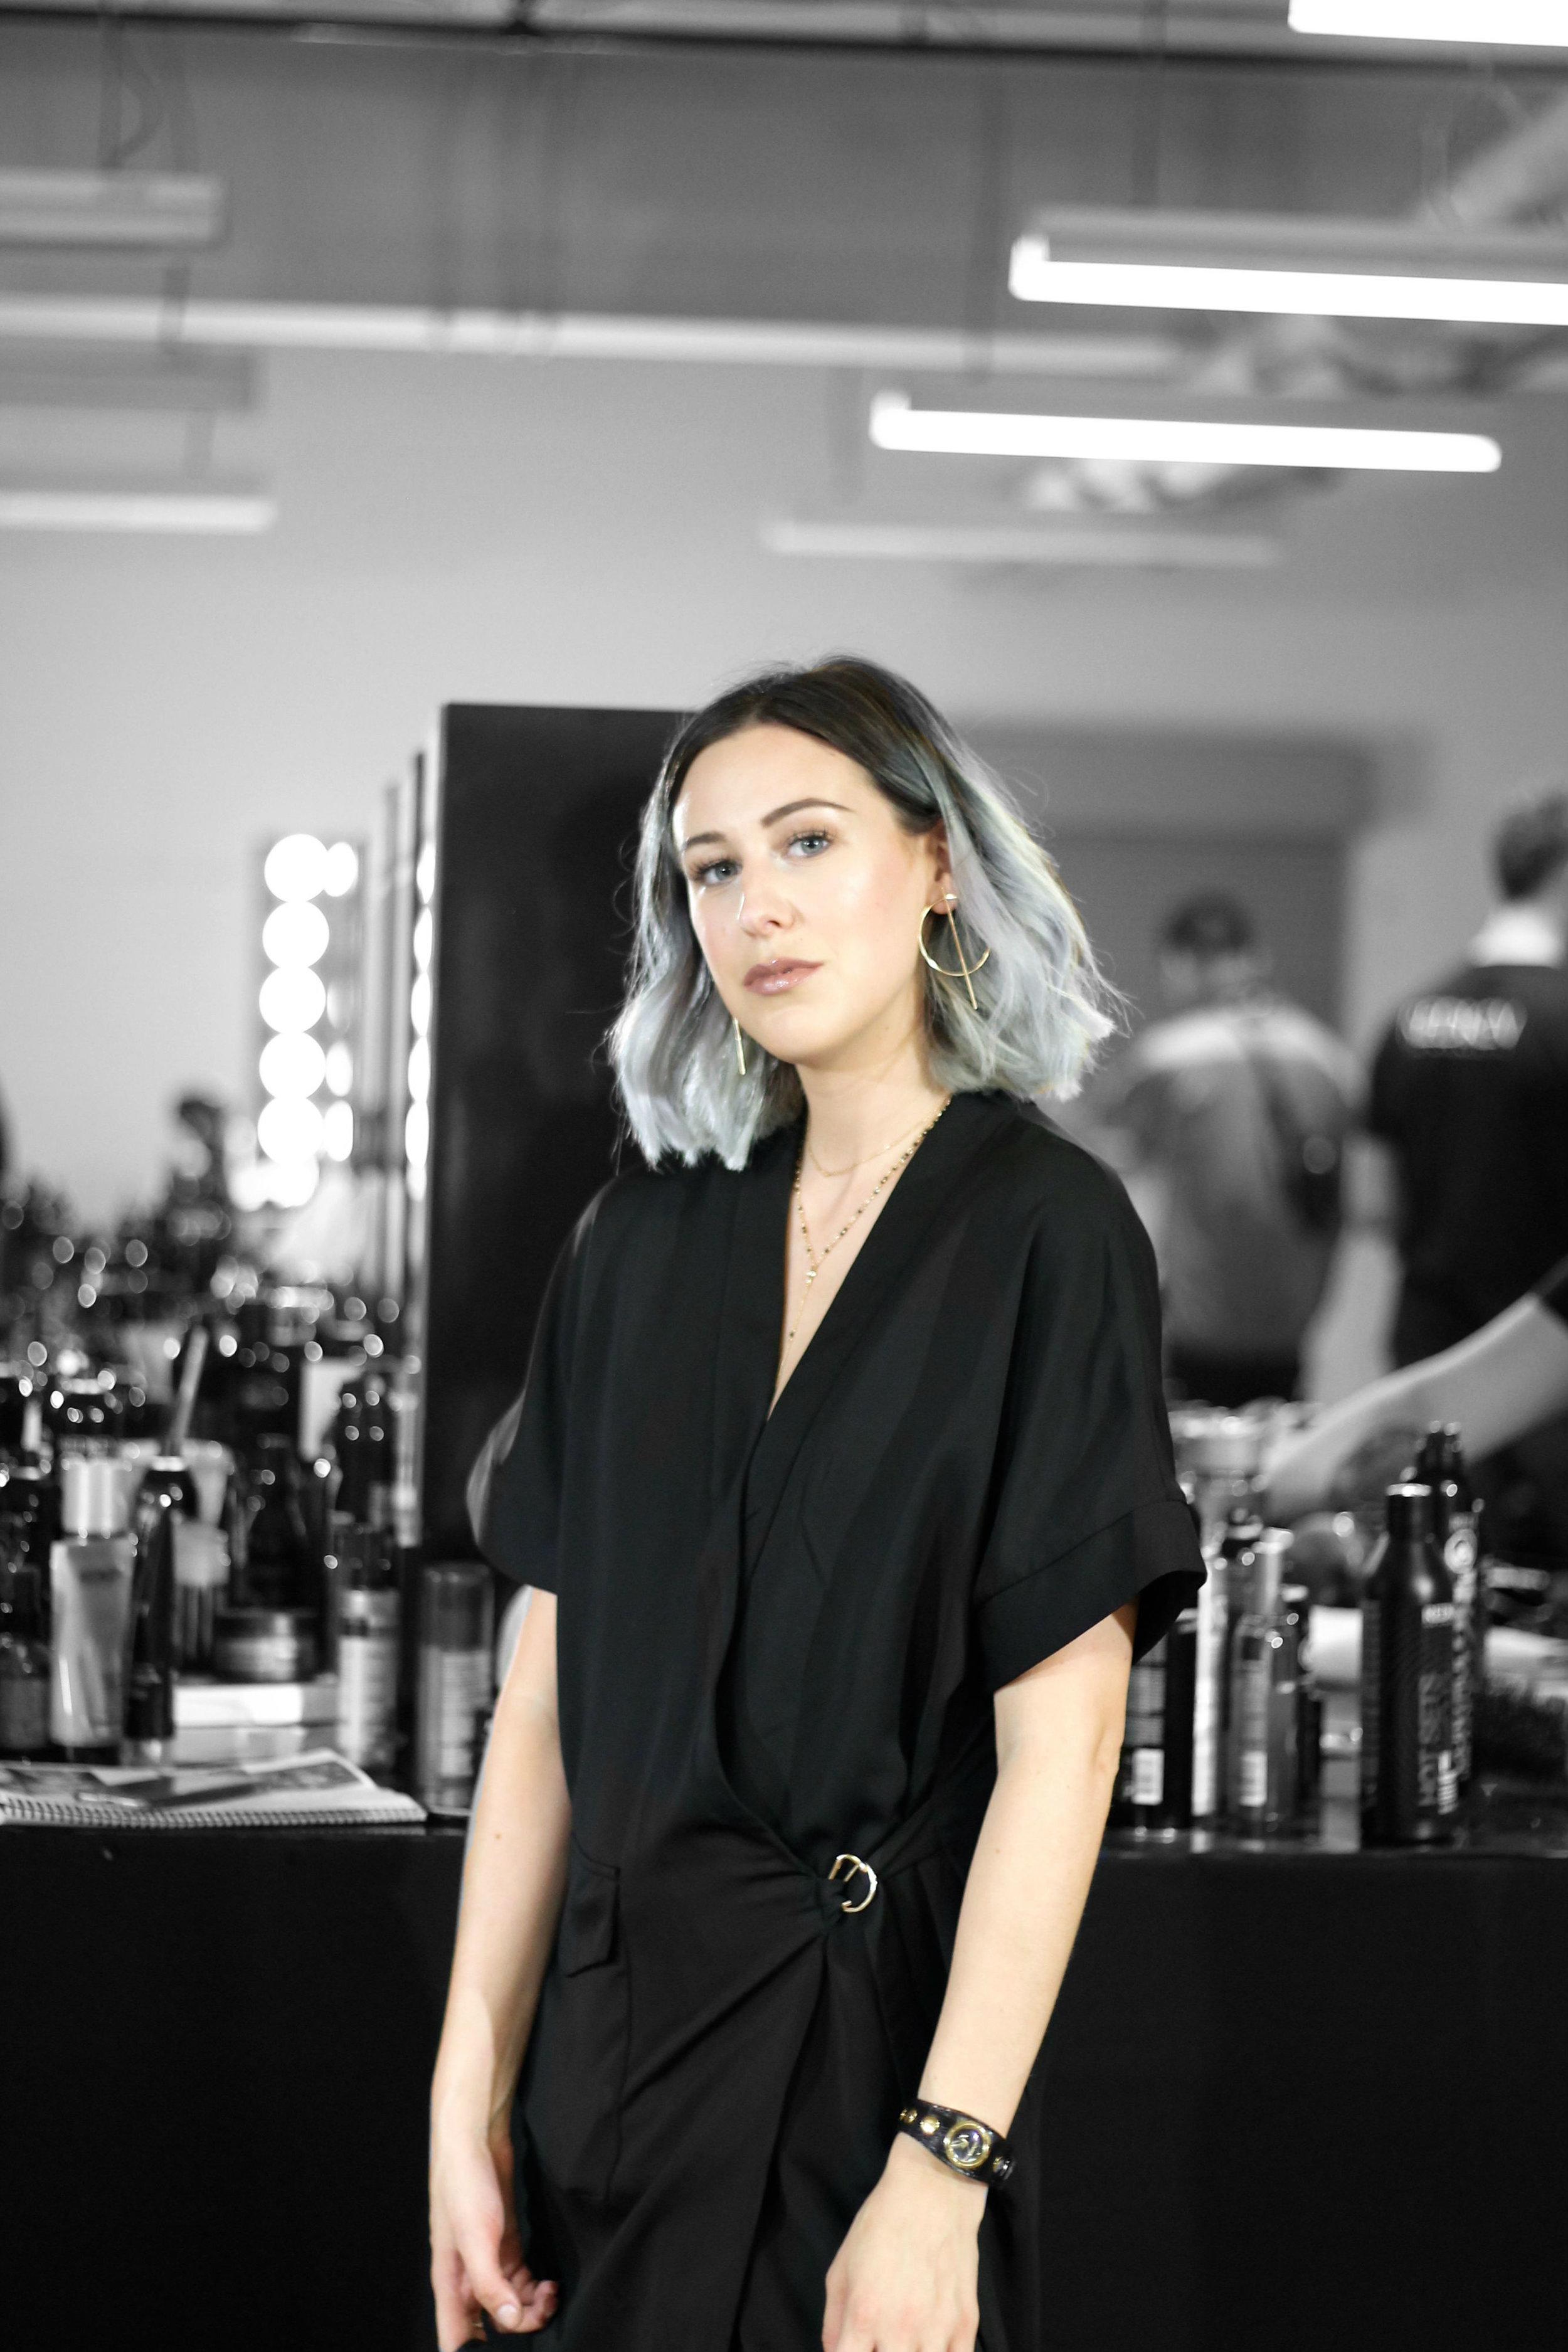 Amy Mckissock Backstage with Redken at Toronto Women's Fashion Week